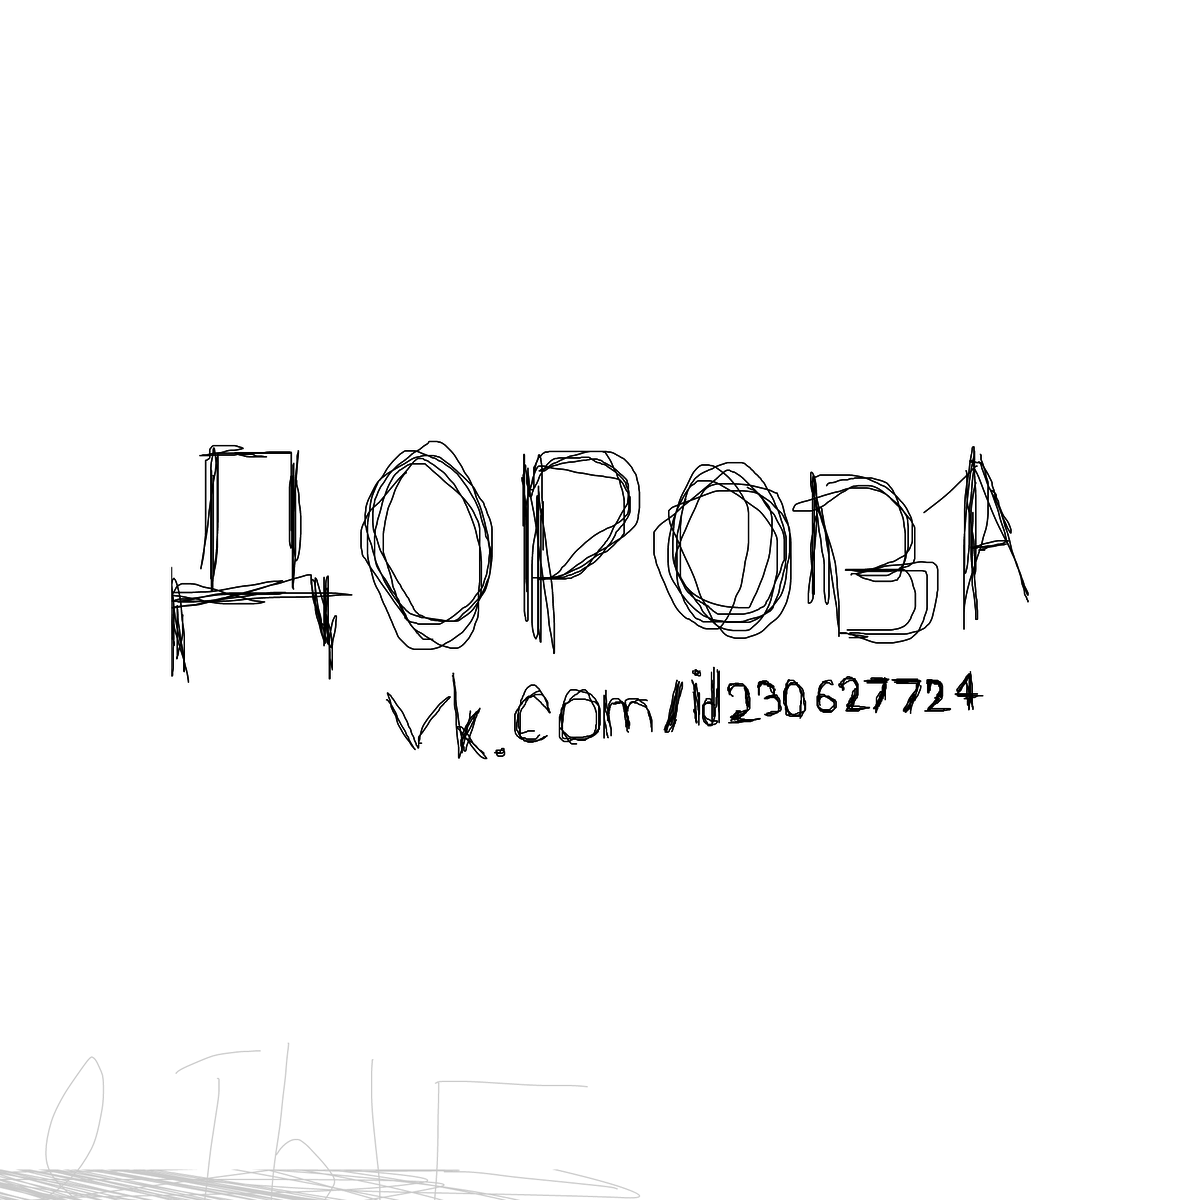 BAAAM drawing#22282 lat:55.7521171569824200lng: 37.6201972961425800